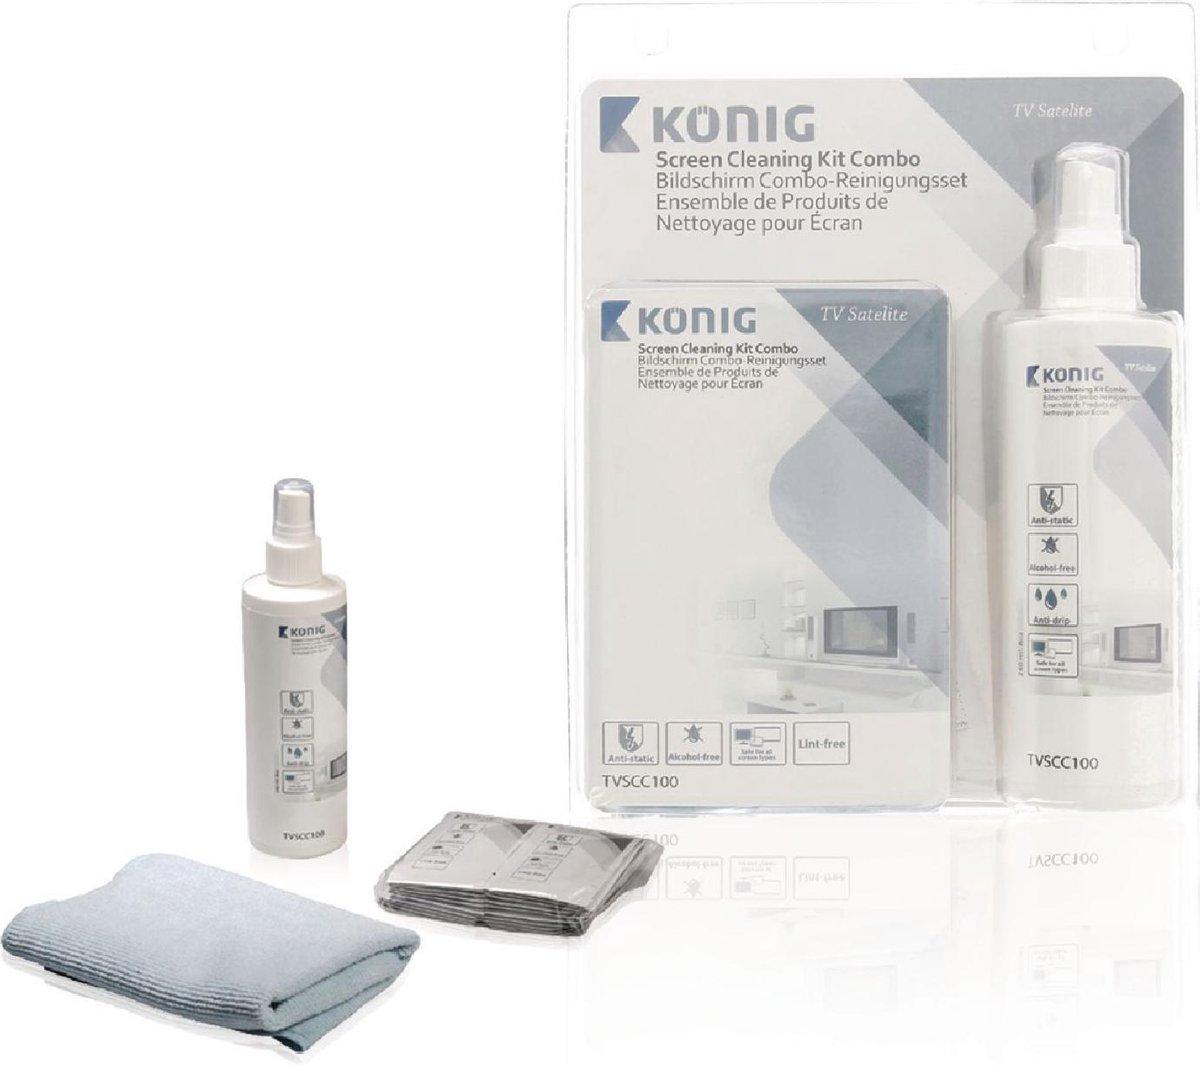 TV and Smart Media Screen Cleaner Kit 240 ml - Konig